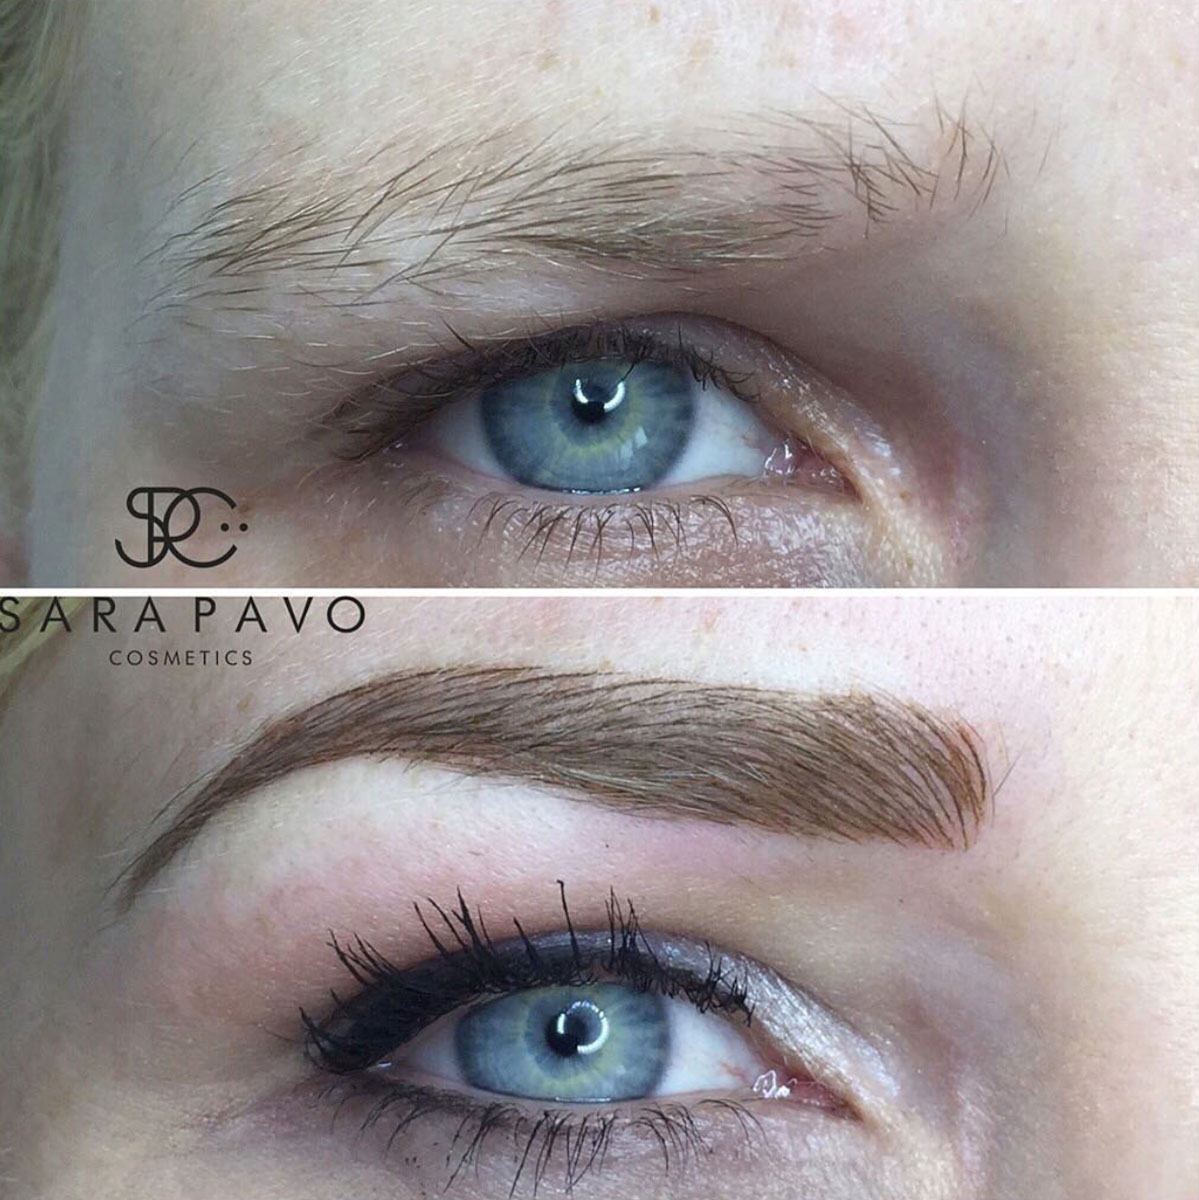 Permanent Make-Up — ✨ SARA PAVO COSMETICS - Dein Kosmetikinstitut